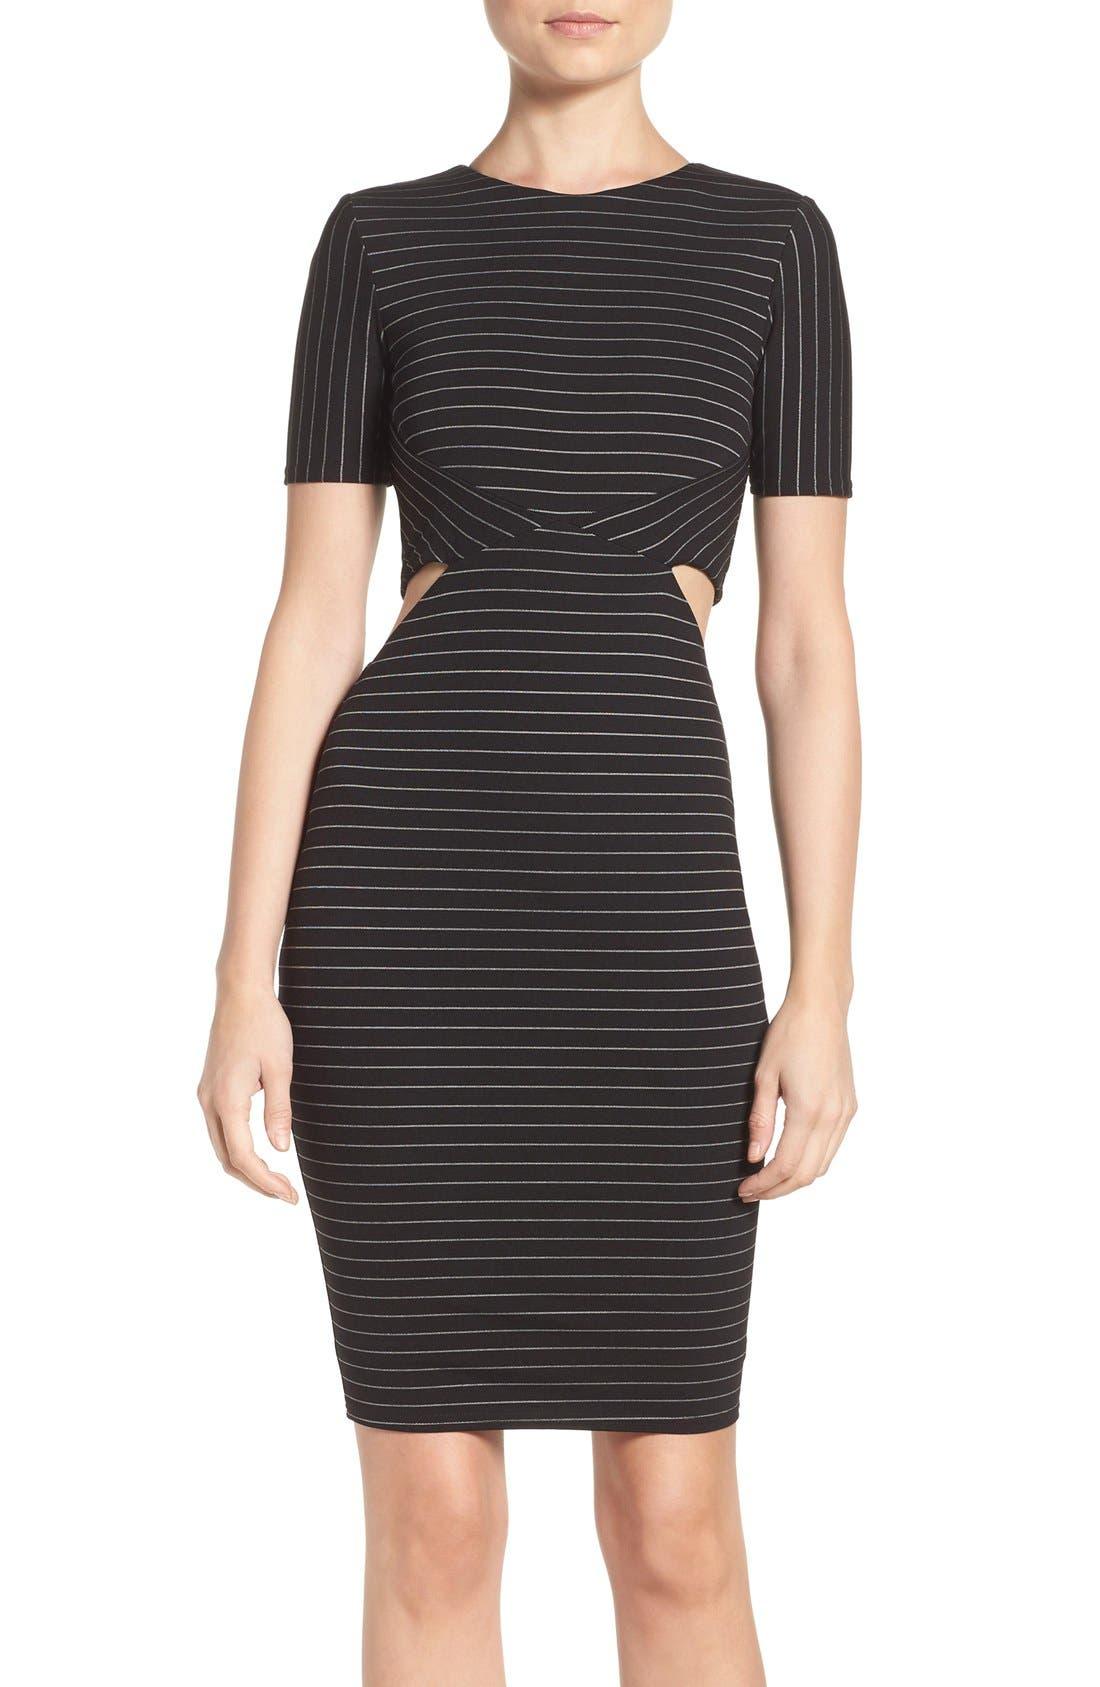 Alternate Image 1 Selected - Ali & Jay Cutout Body-Con Dress